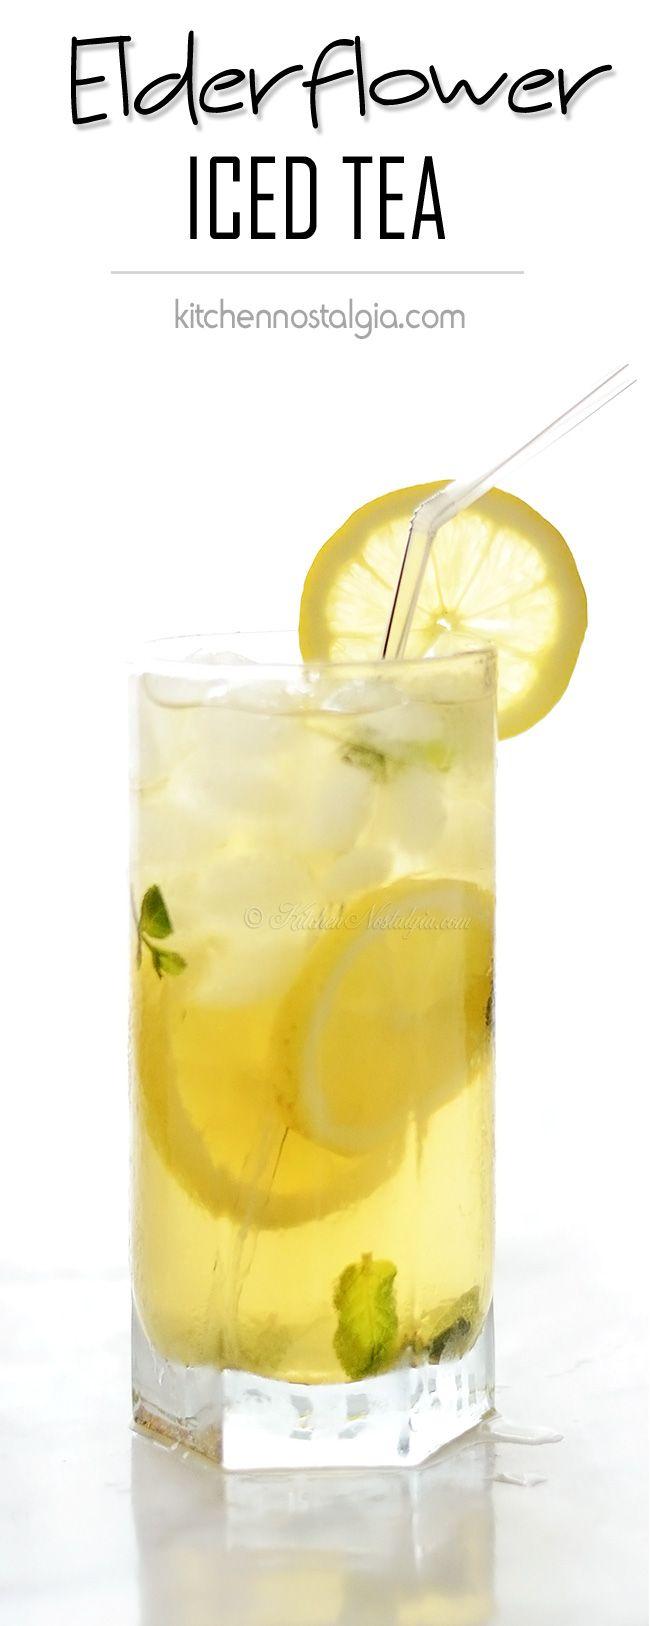 Elderflower Iced Tea - very healthy and super-delicious summer refreshment - kitchennostalgia.com